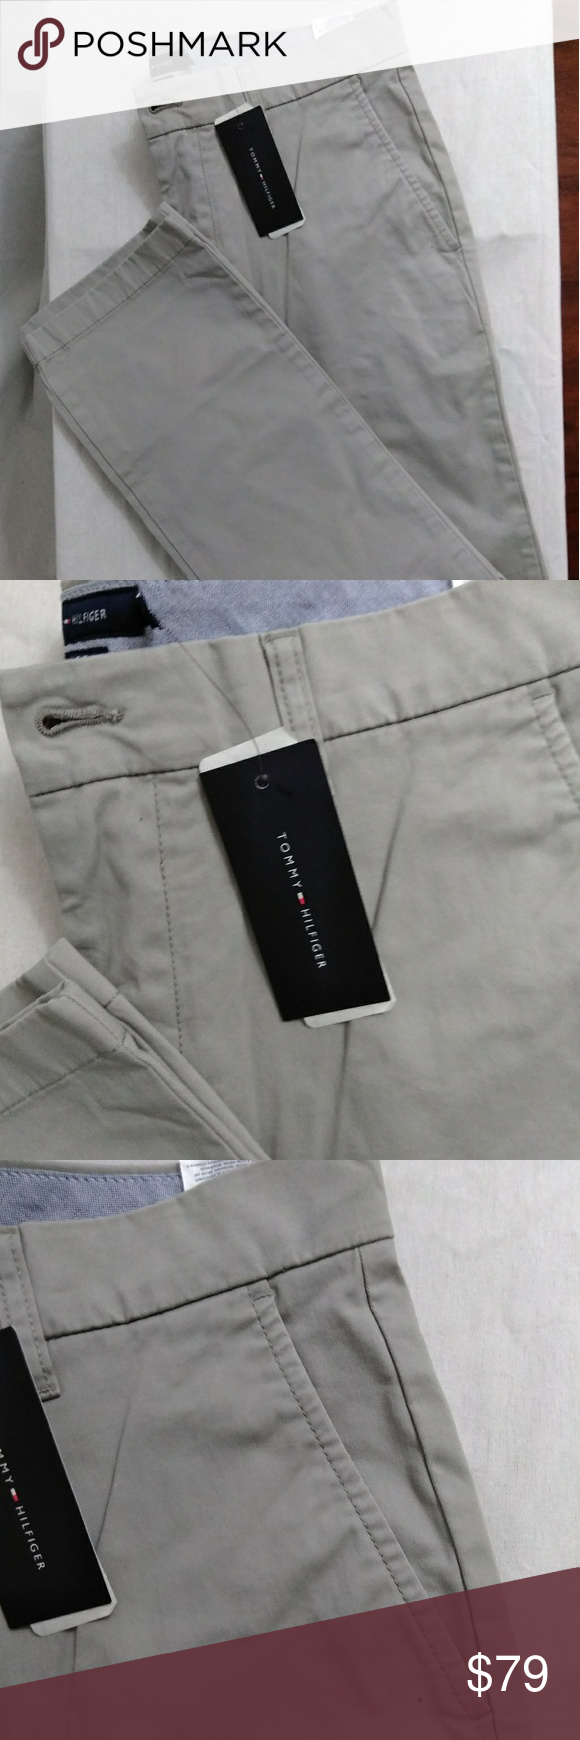 retail prices top fashion premium selection Tommy Hilfiger Khaki Pants Brand new Tommy Hilfiger men's khaki ...